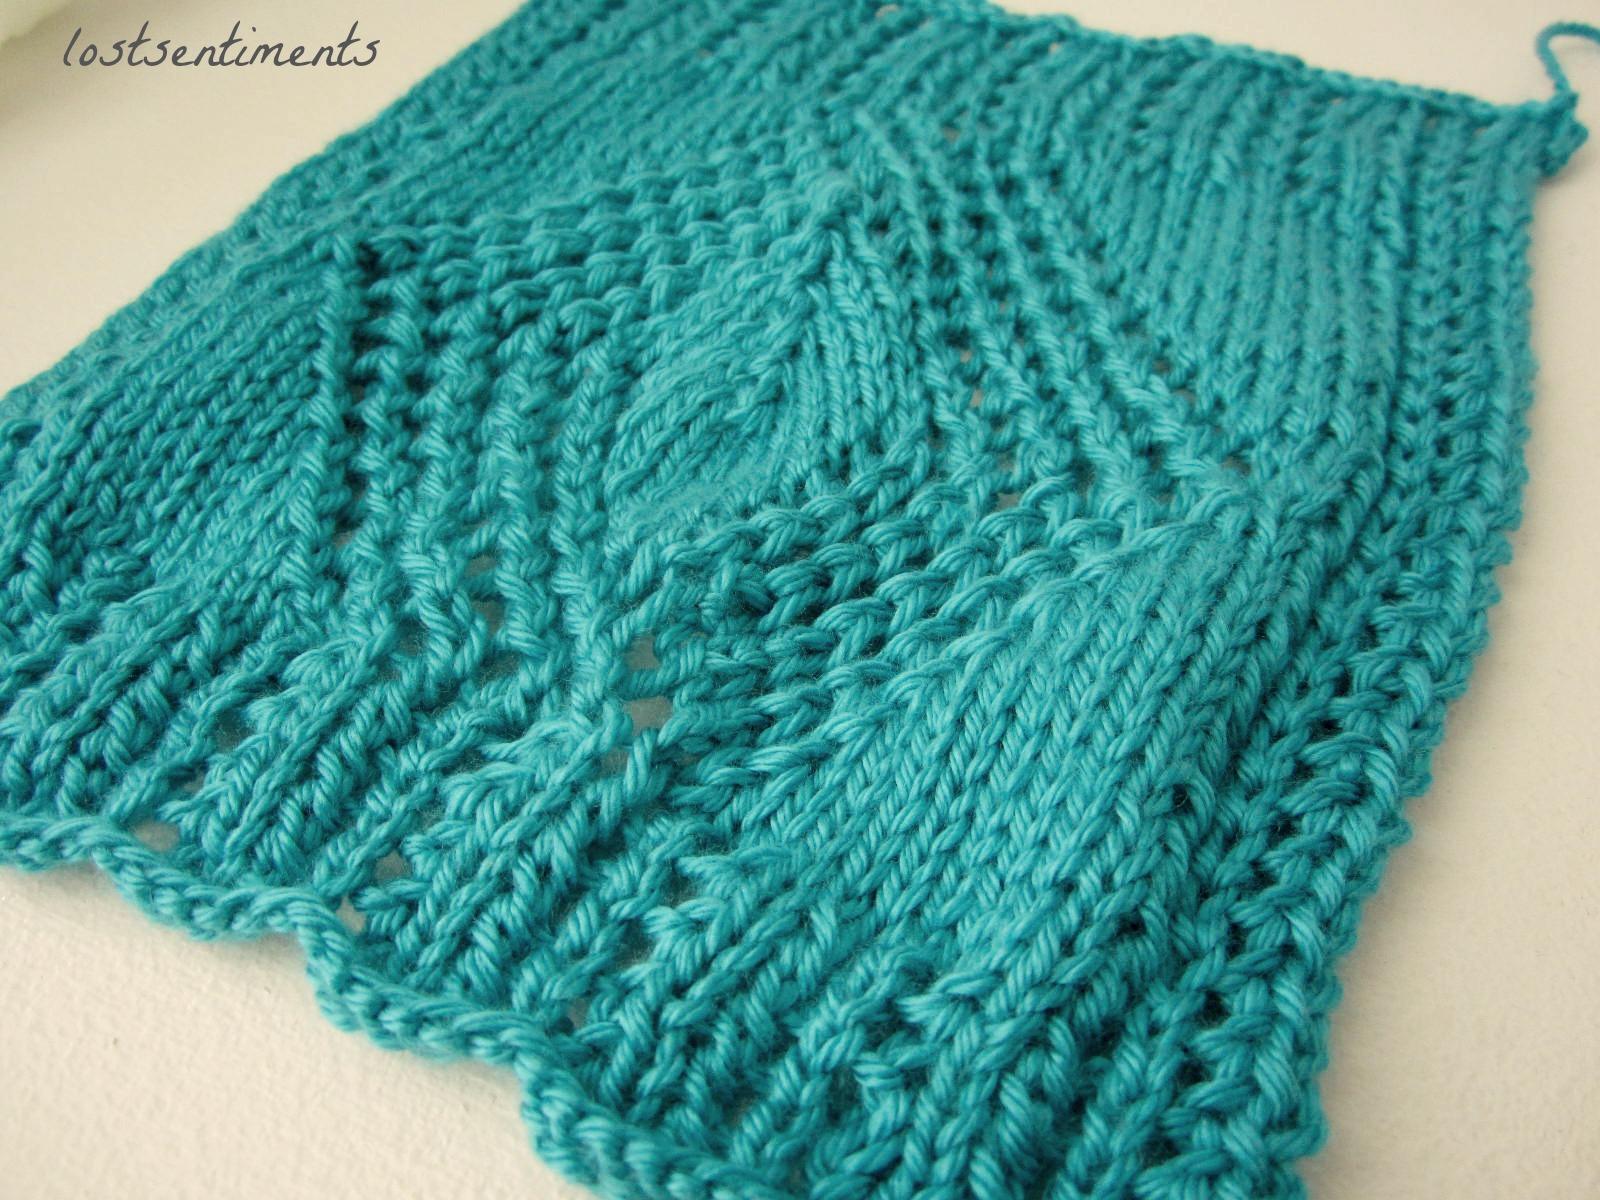 lostsentiments: Openwork Diamond Scarf - Free Knitting Pattern